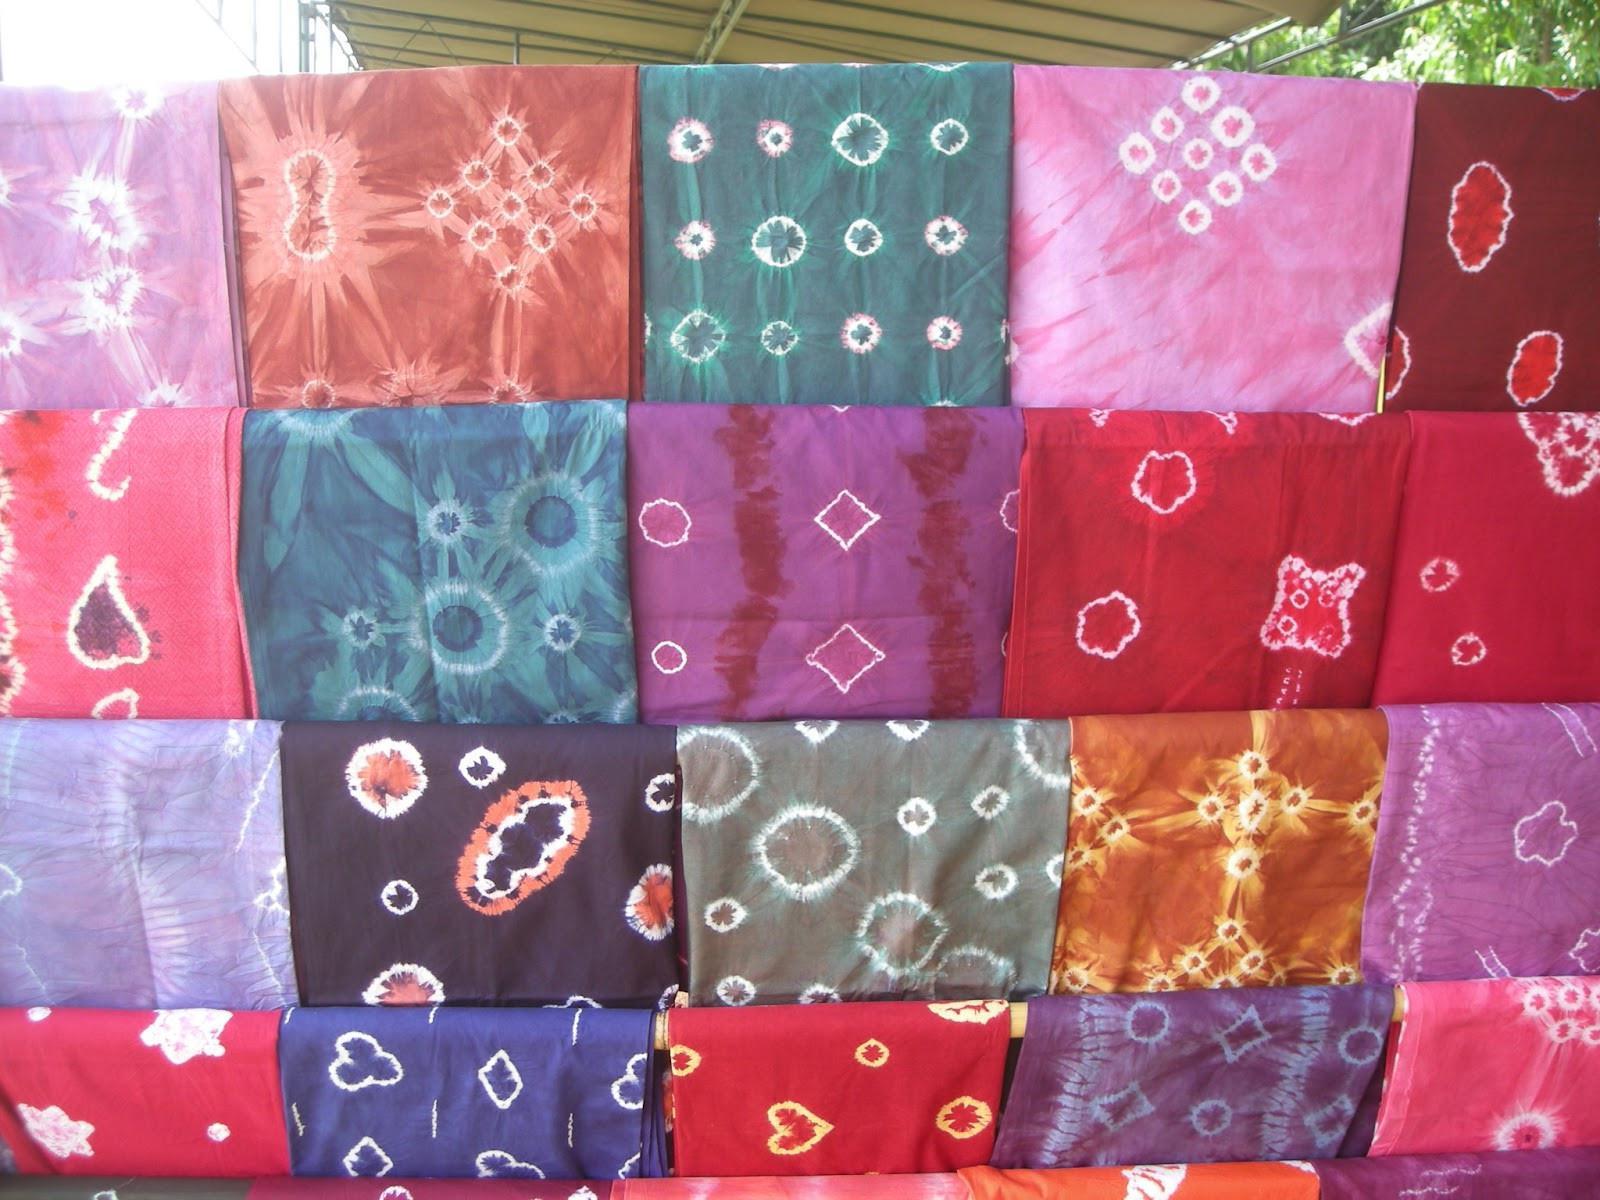 Batik Jumputan Inovasi Modern Kain Batik Indonesia